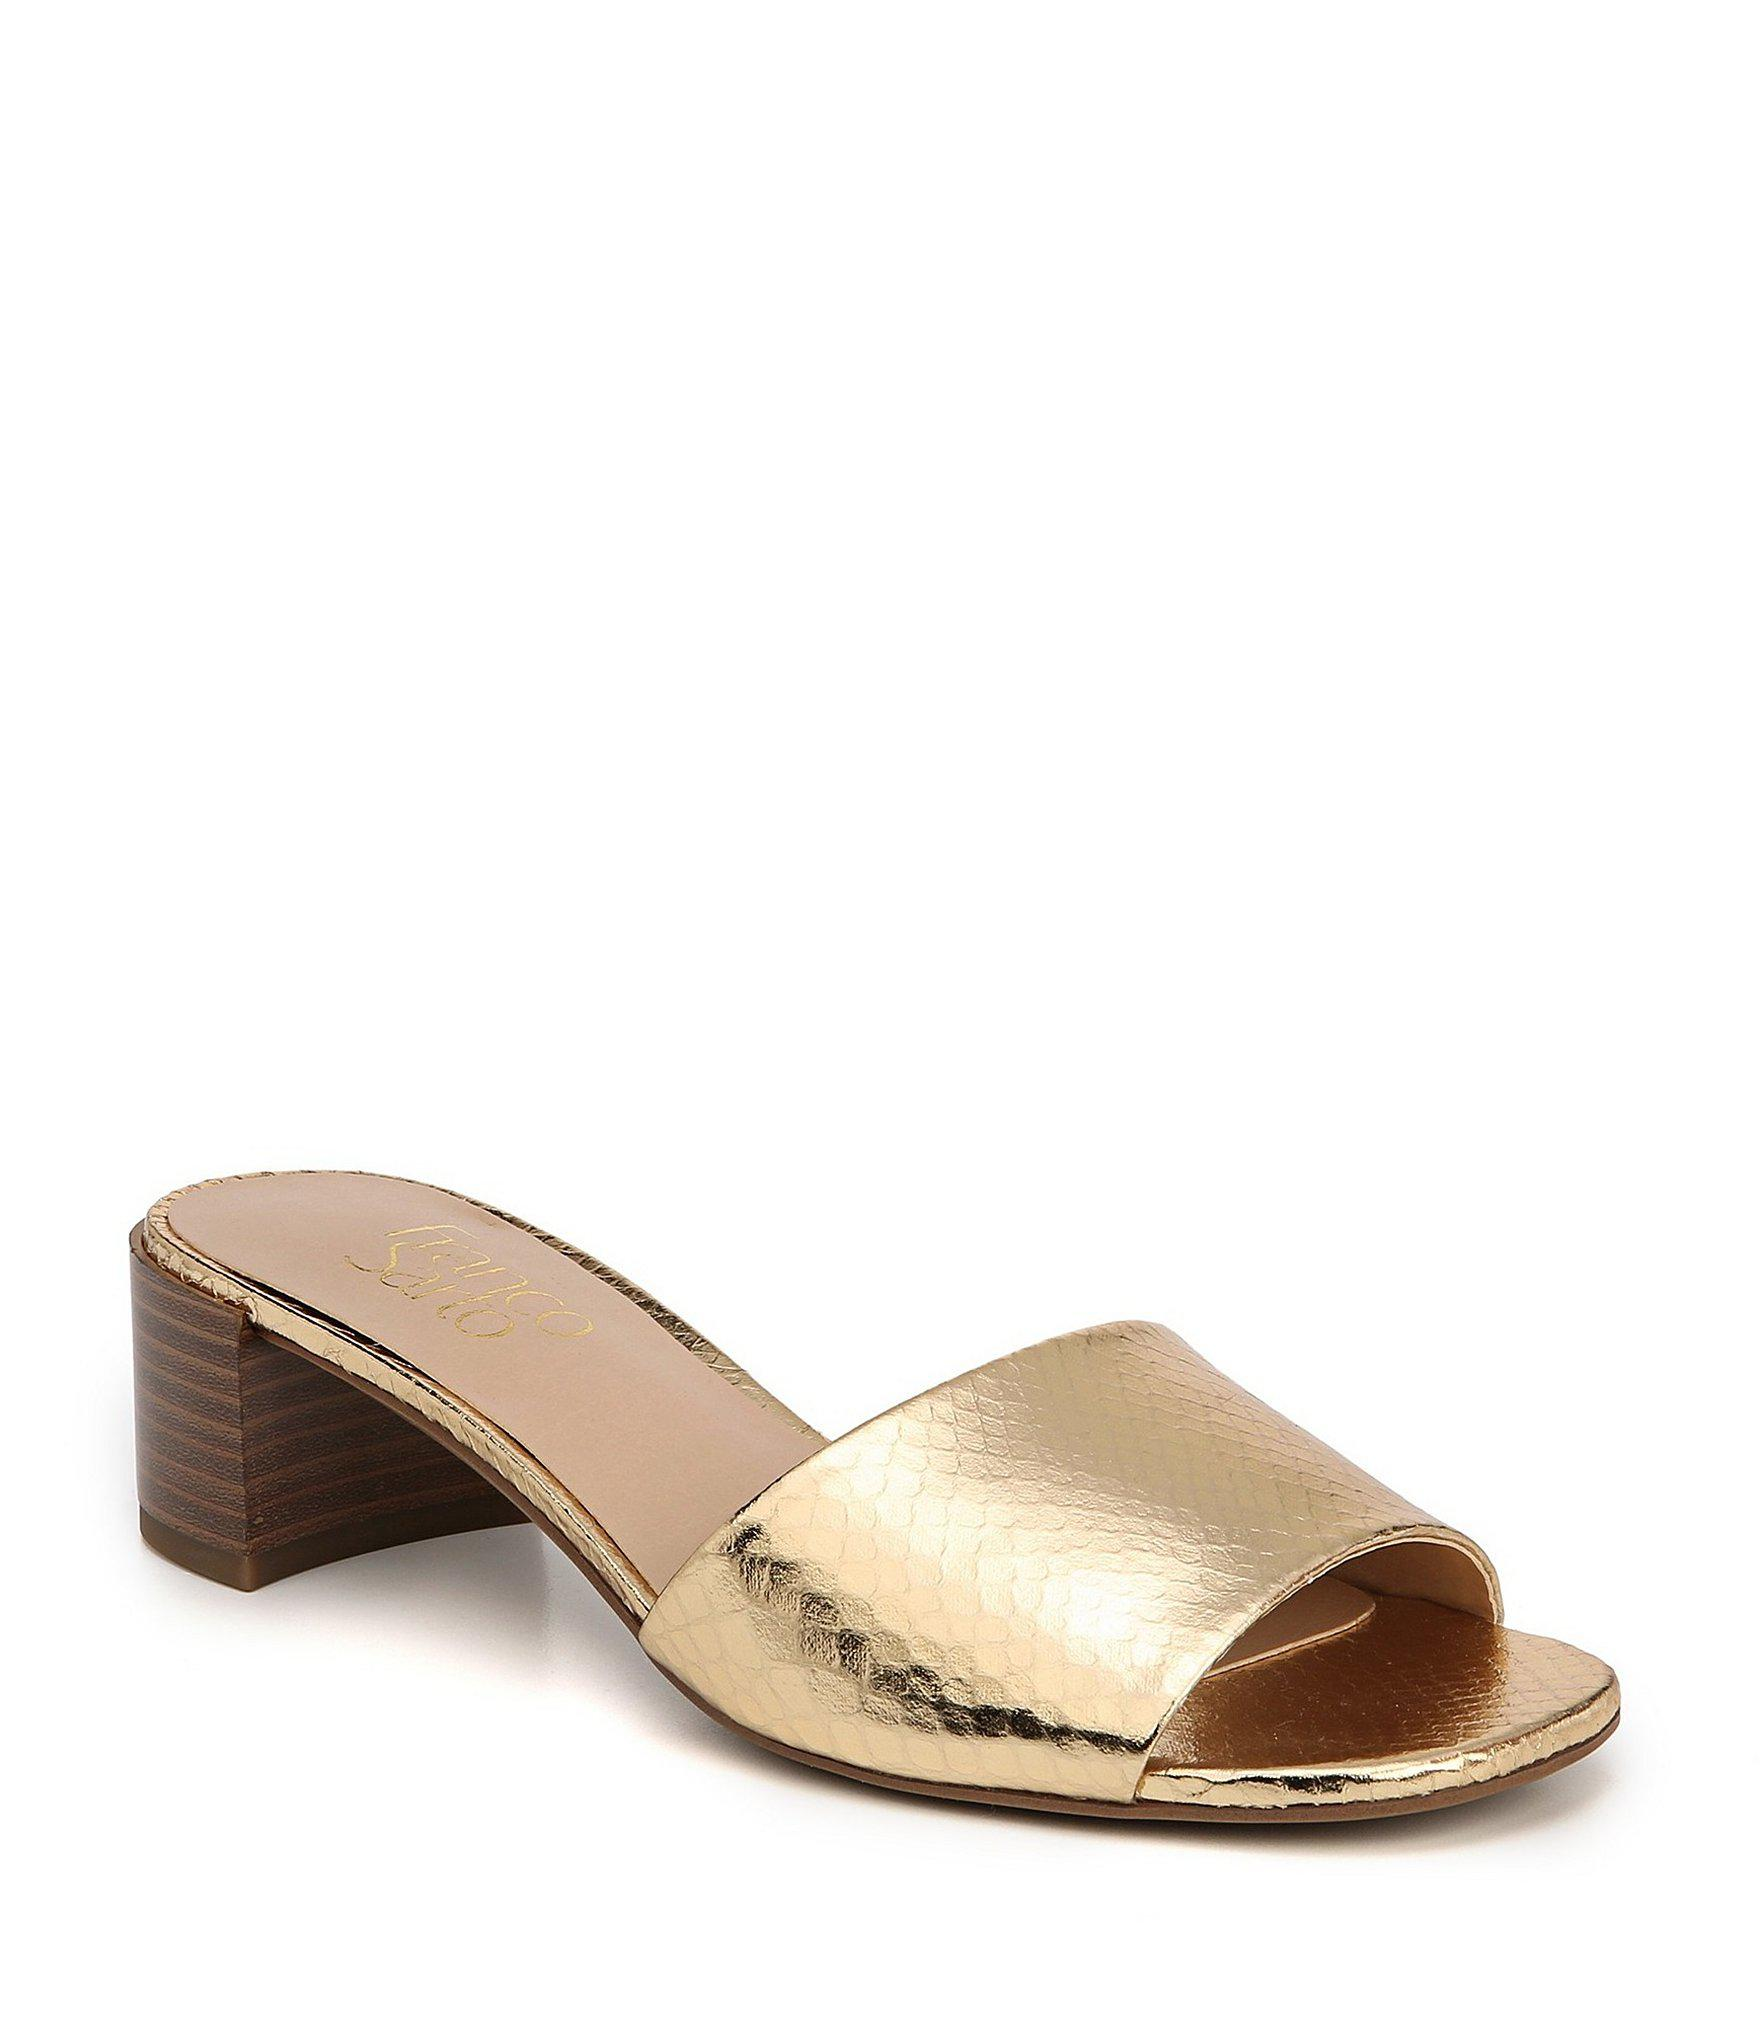 180da890d003 Franco Sarto Ramy Metallic Block Heel Slides in Metallic - Lyst